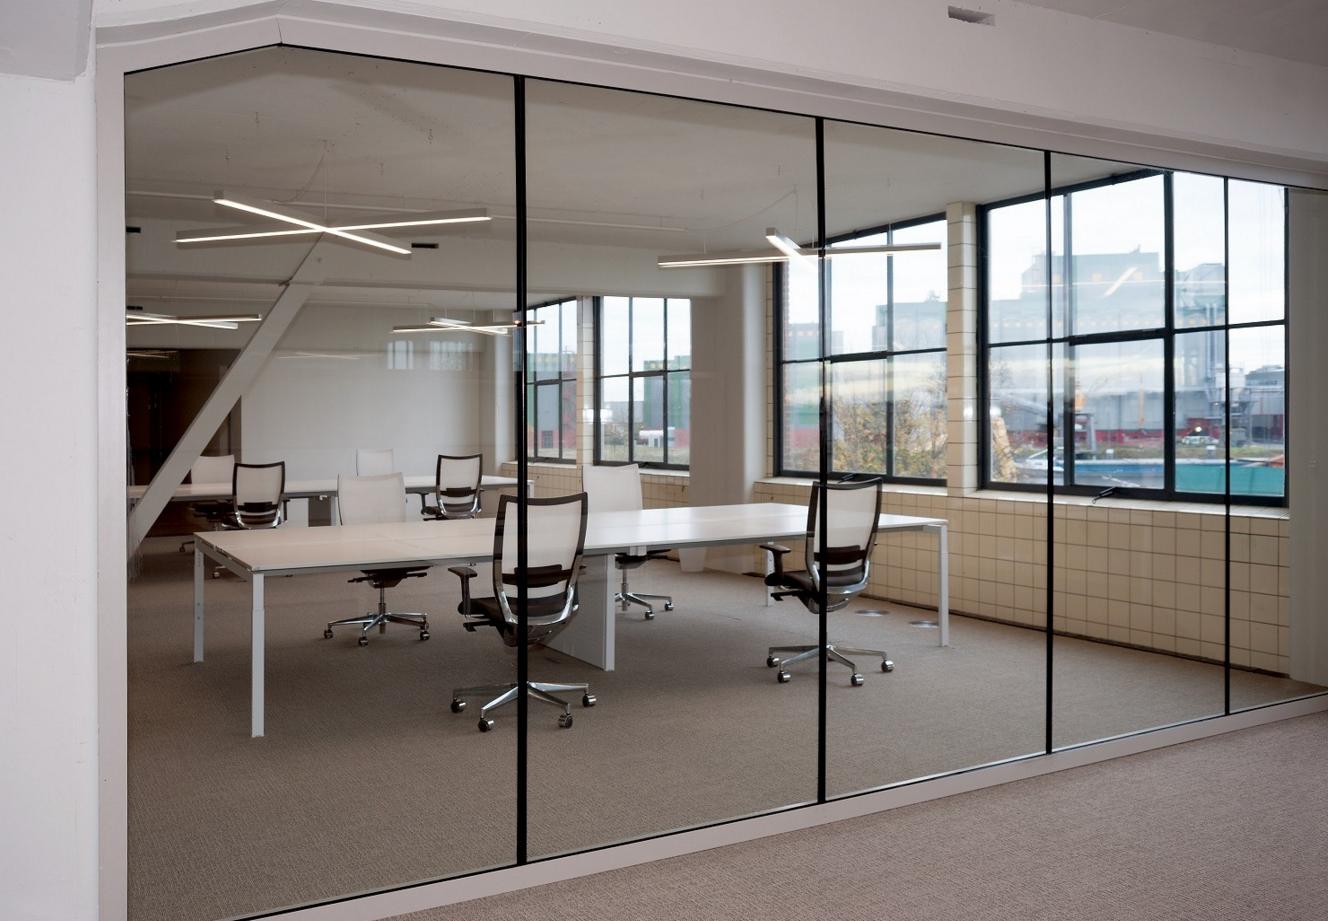 Industri le kantoorinrichting havic kantoormeubelen - Moderne kantoorbureaus ...